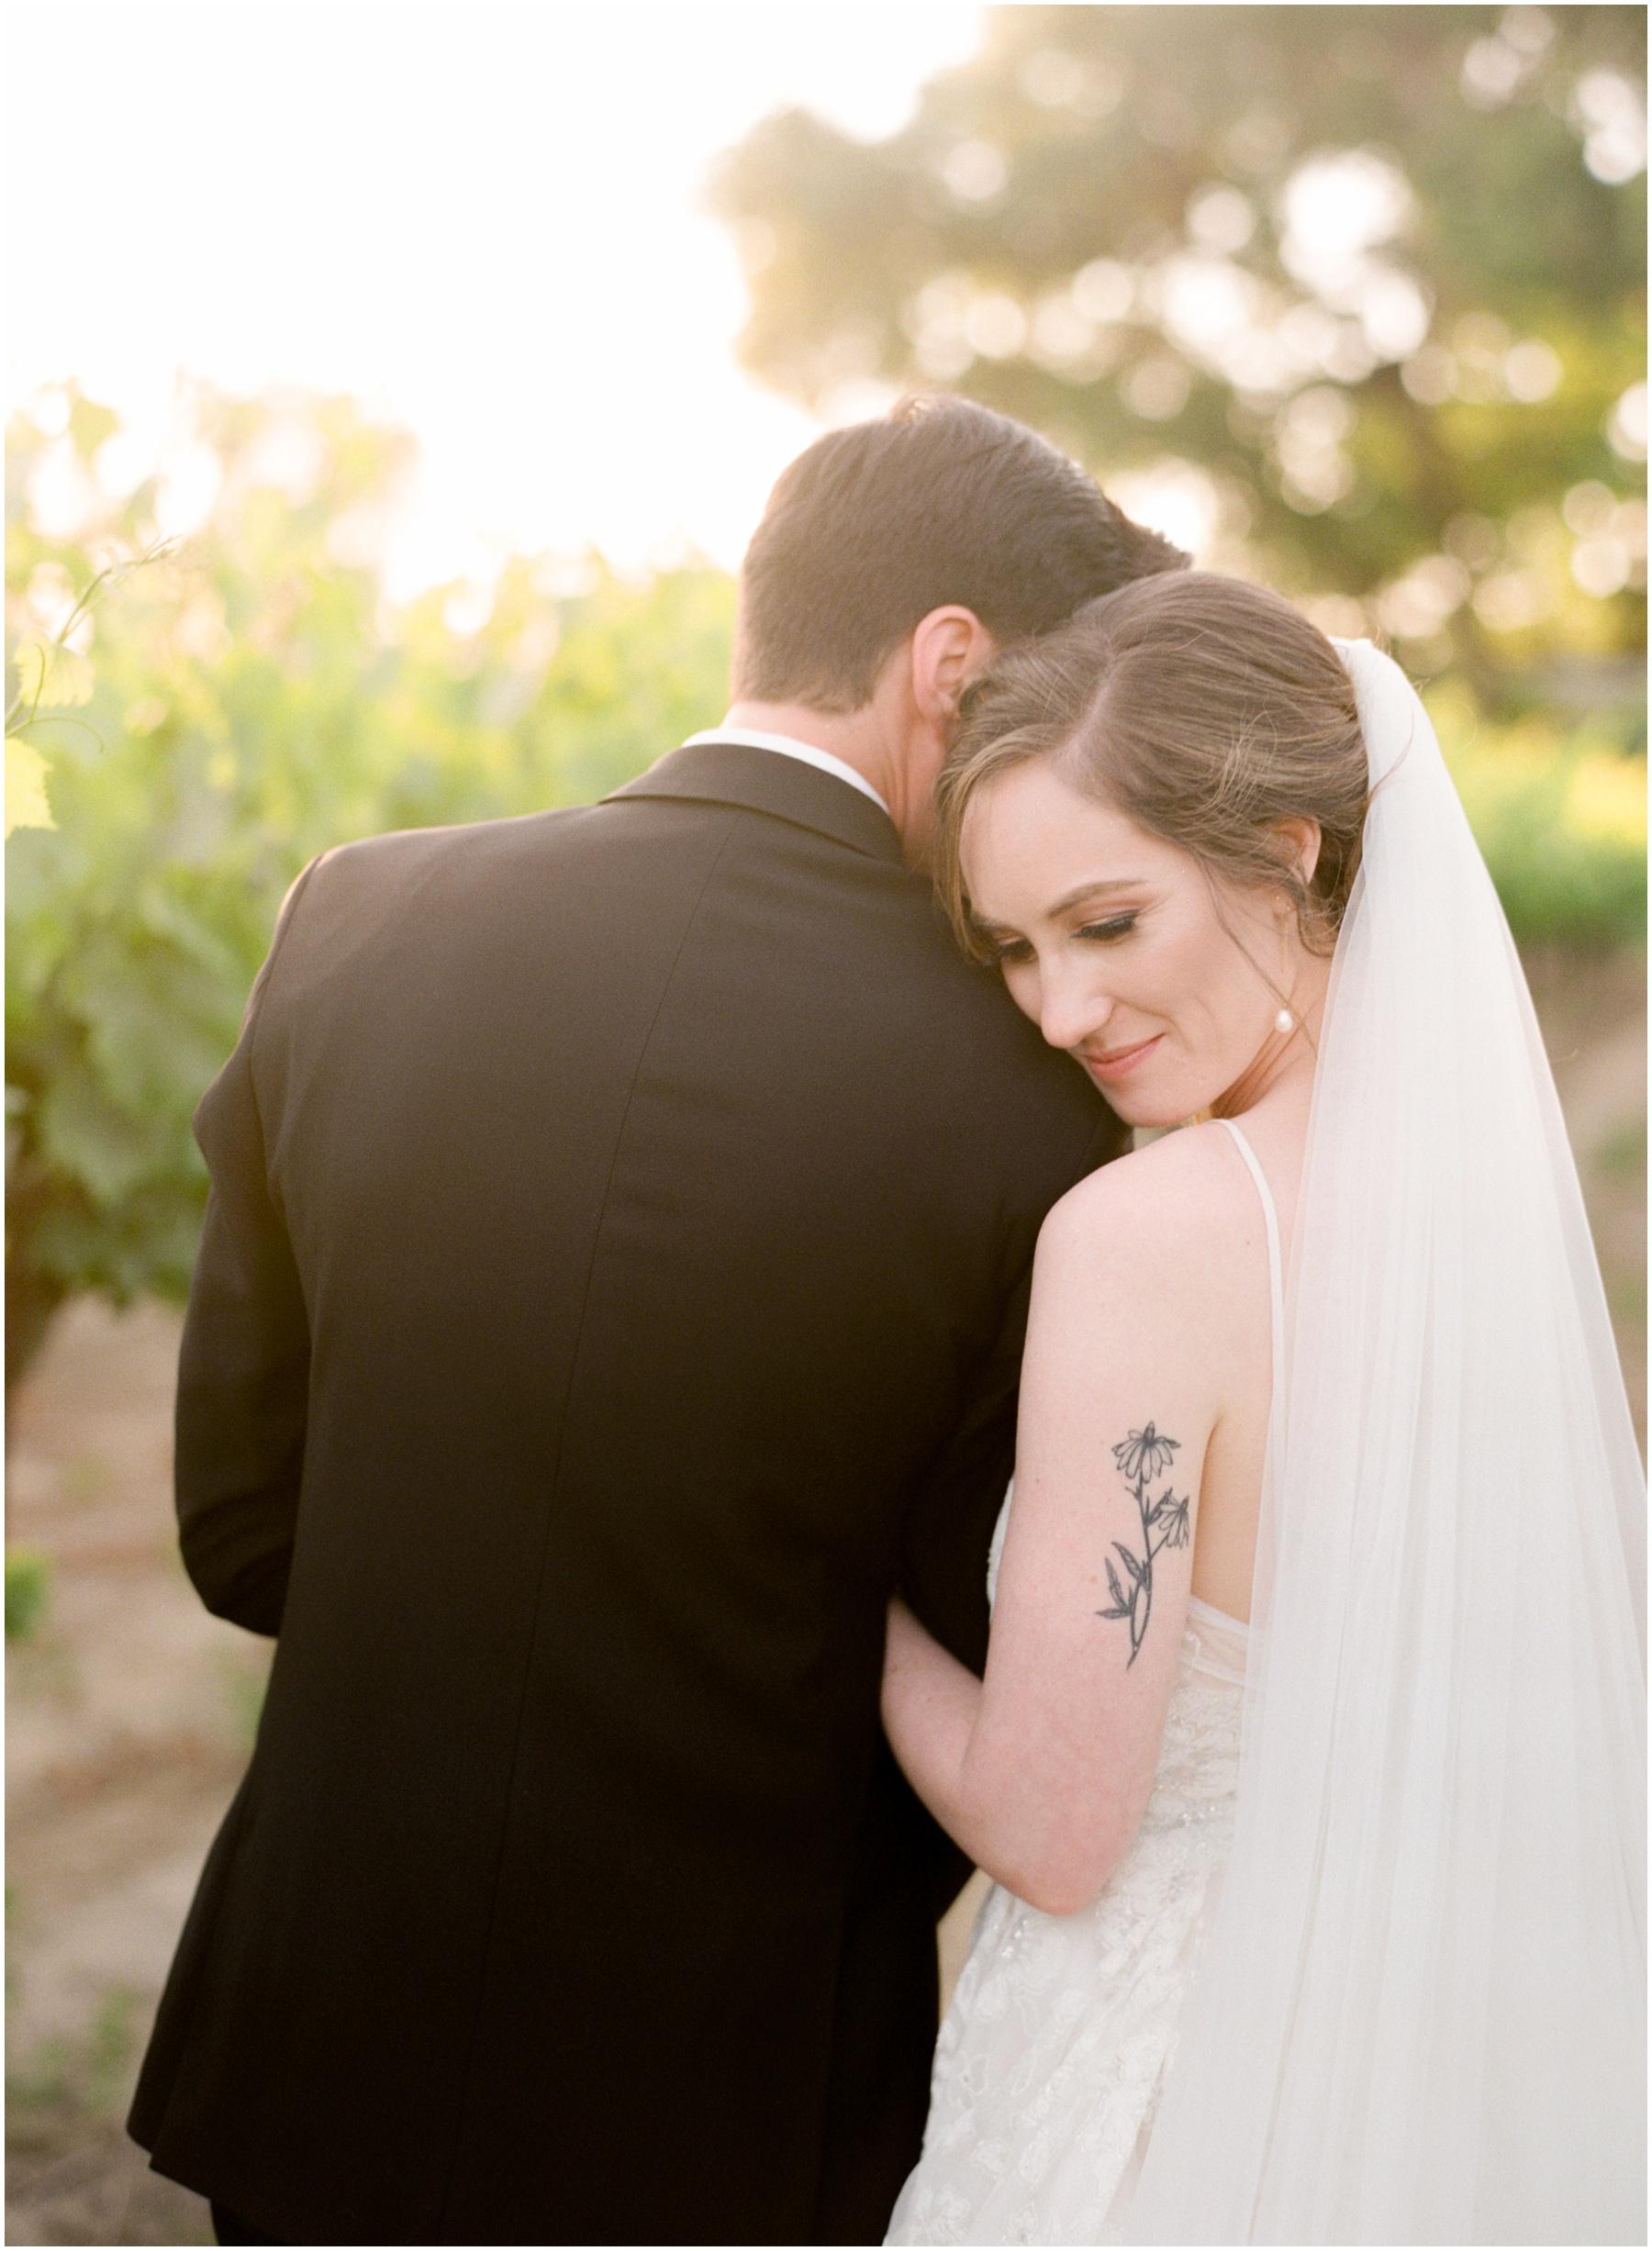 Scribner-bend-vineyards-wedding-sacramento-california-Kristine-Herman-Photography-56.jpg